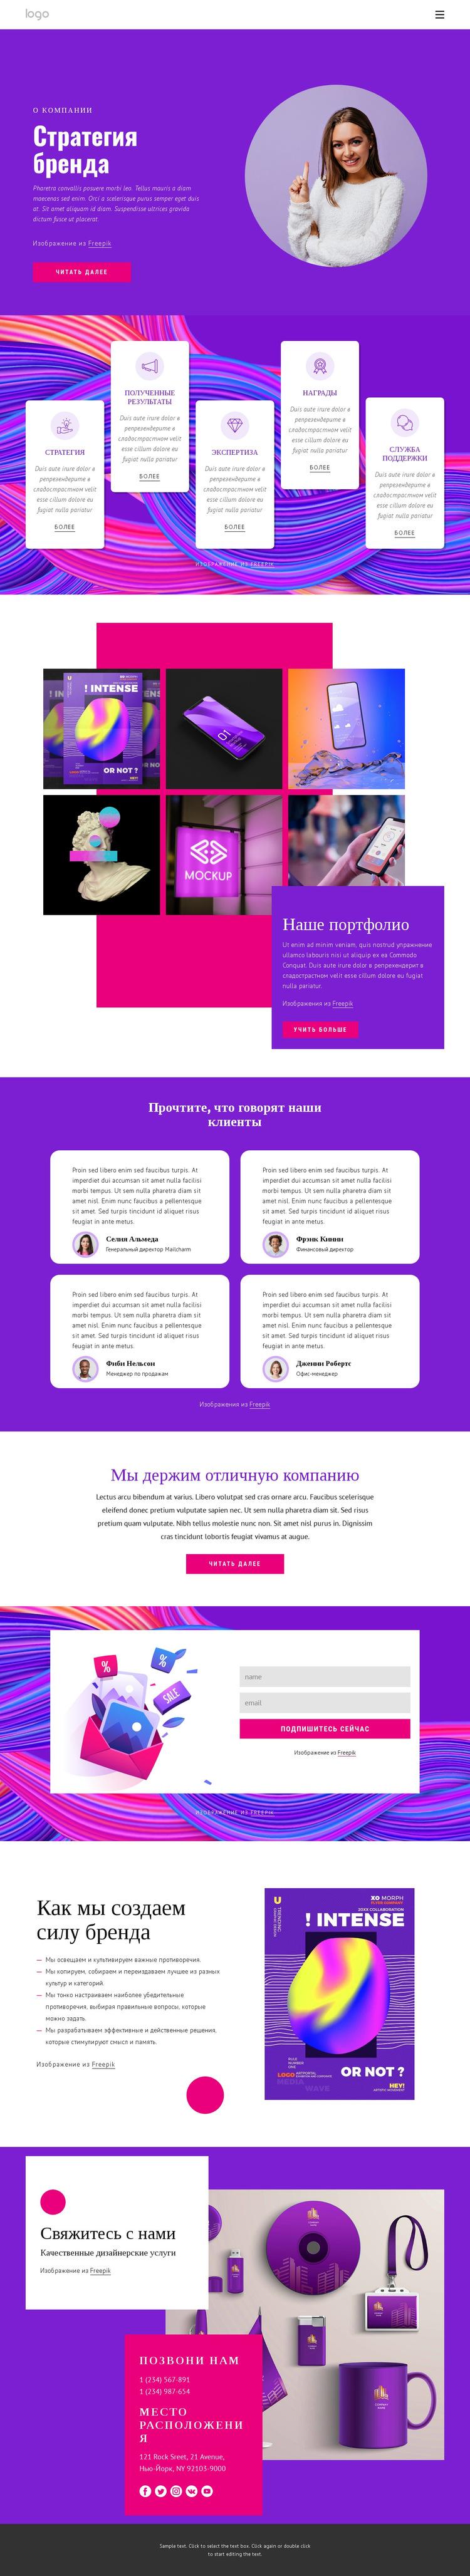 Агентство стратегии бренда Шаблон веб-сайта